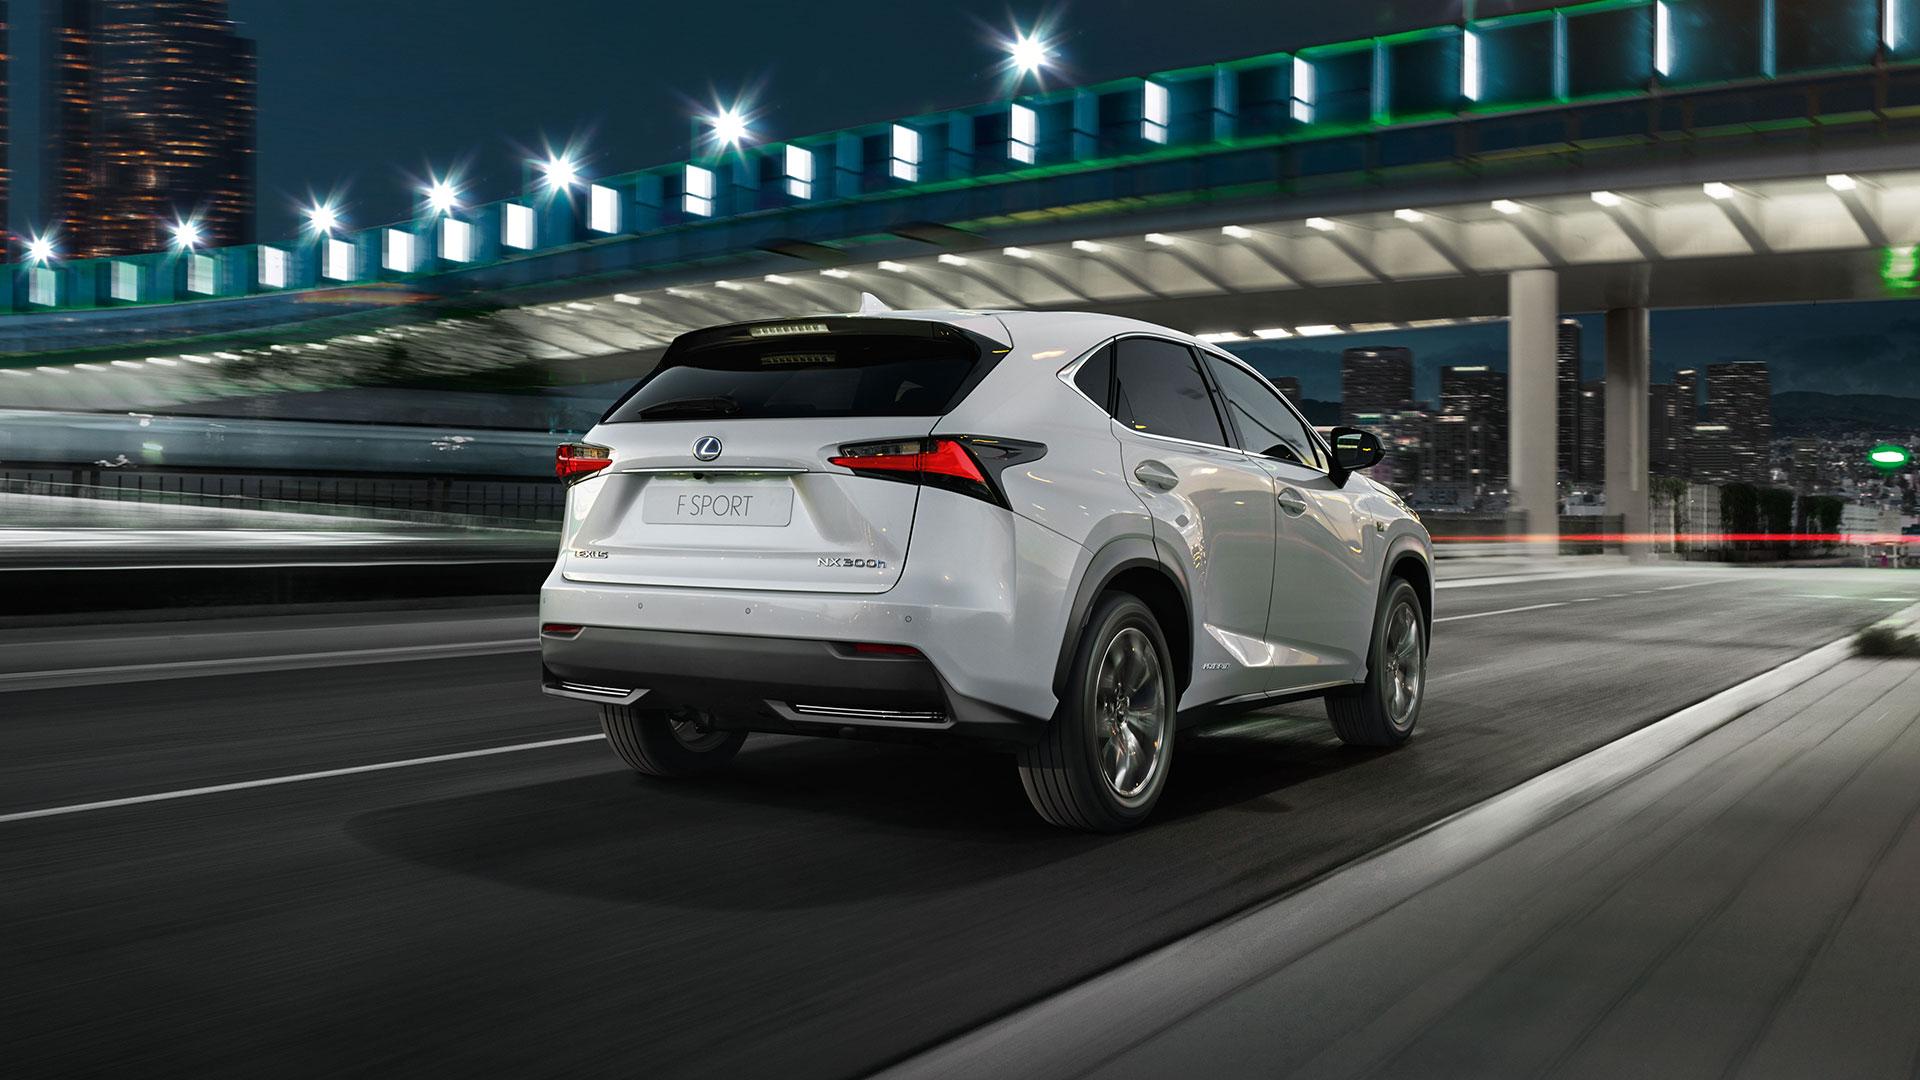 2017 Lexus Nx 300h Next Steps Personalise